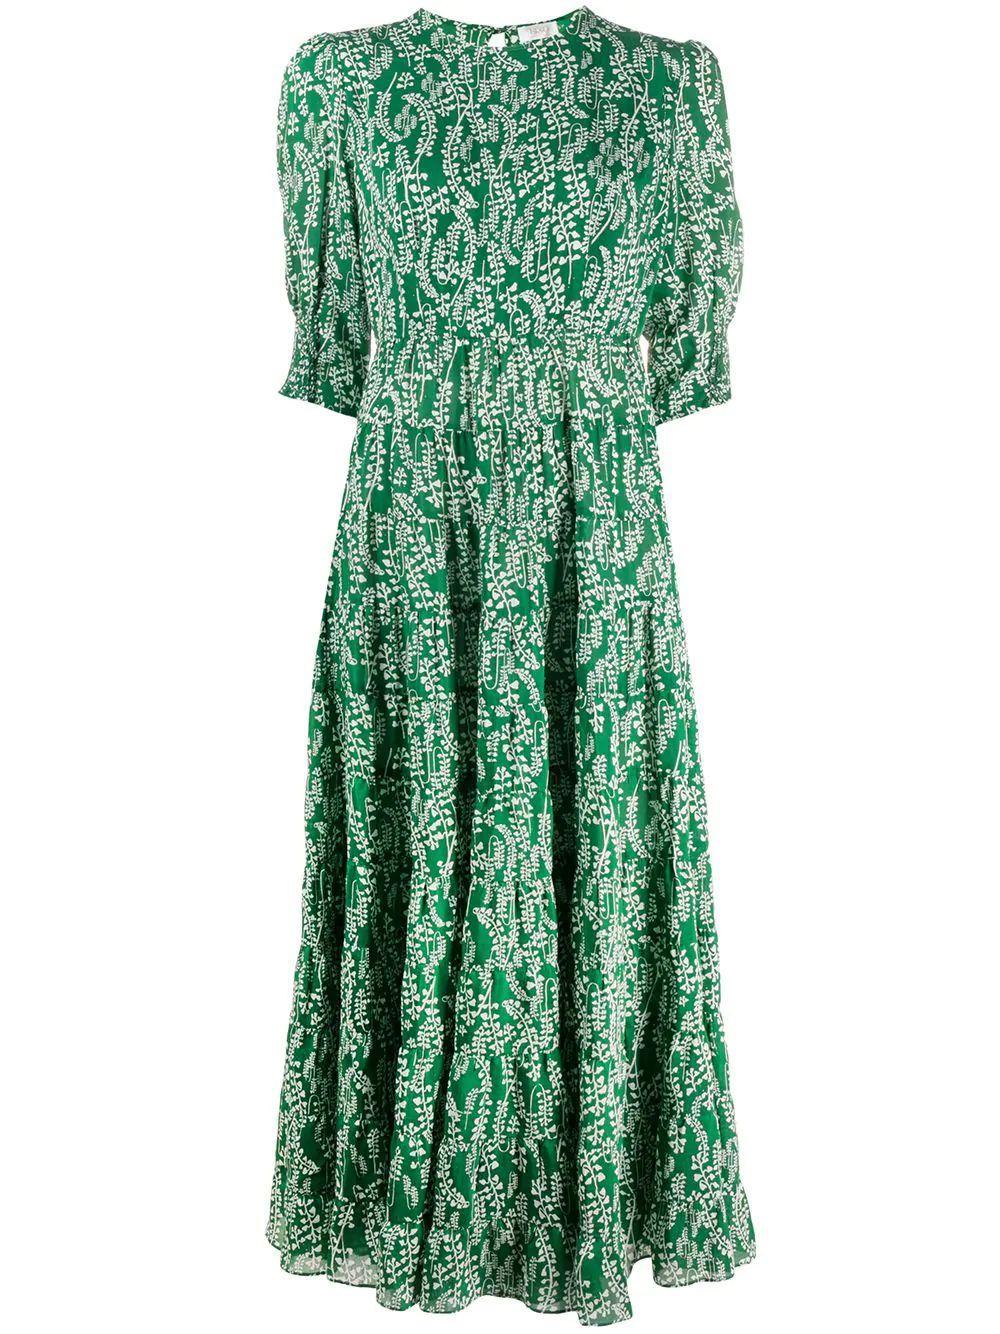 Kristen Tiered Maxi Dress